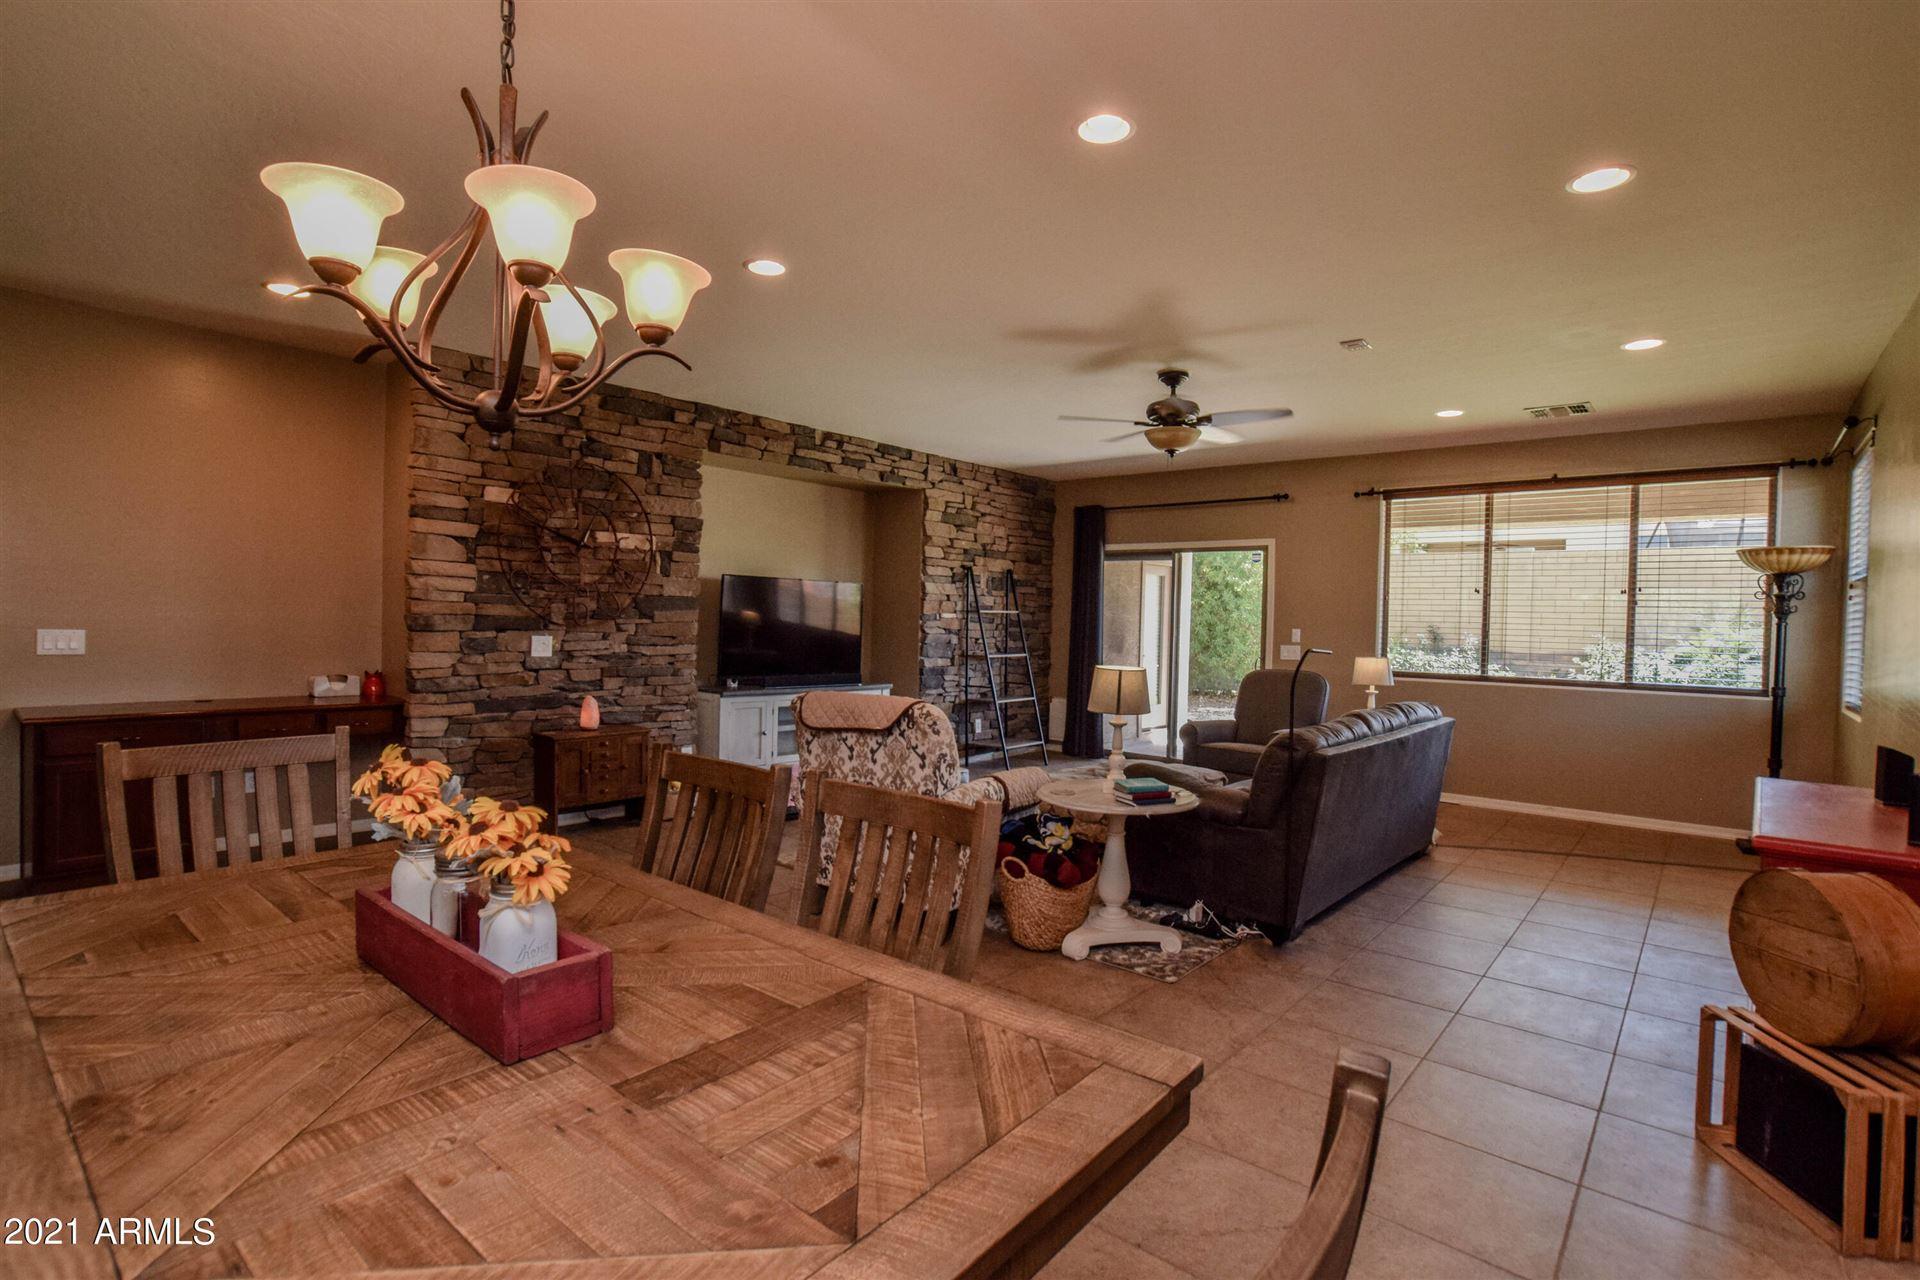 Photo of 775 W DESERT HILLS Drive, San Tan Valley, AZ 85143 (MLS # 6230054)